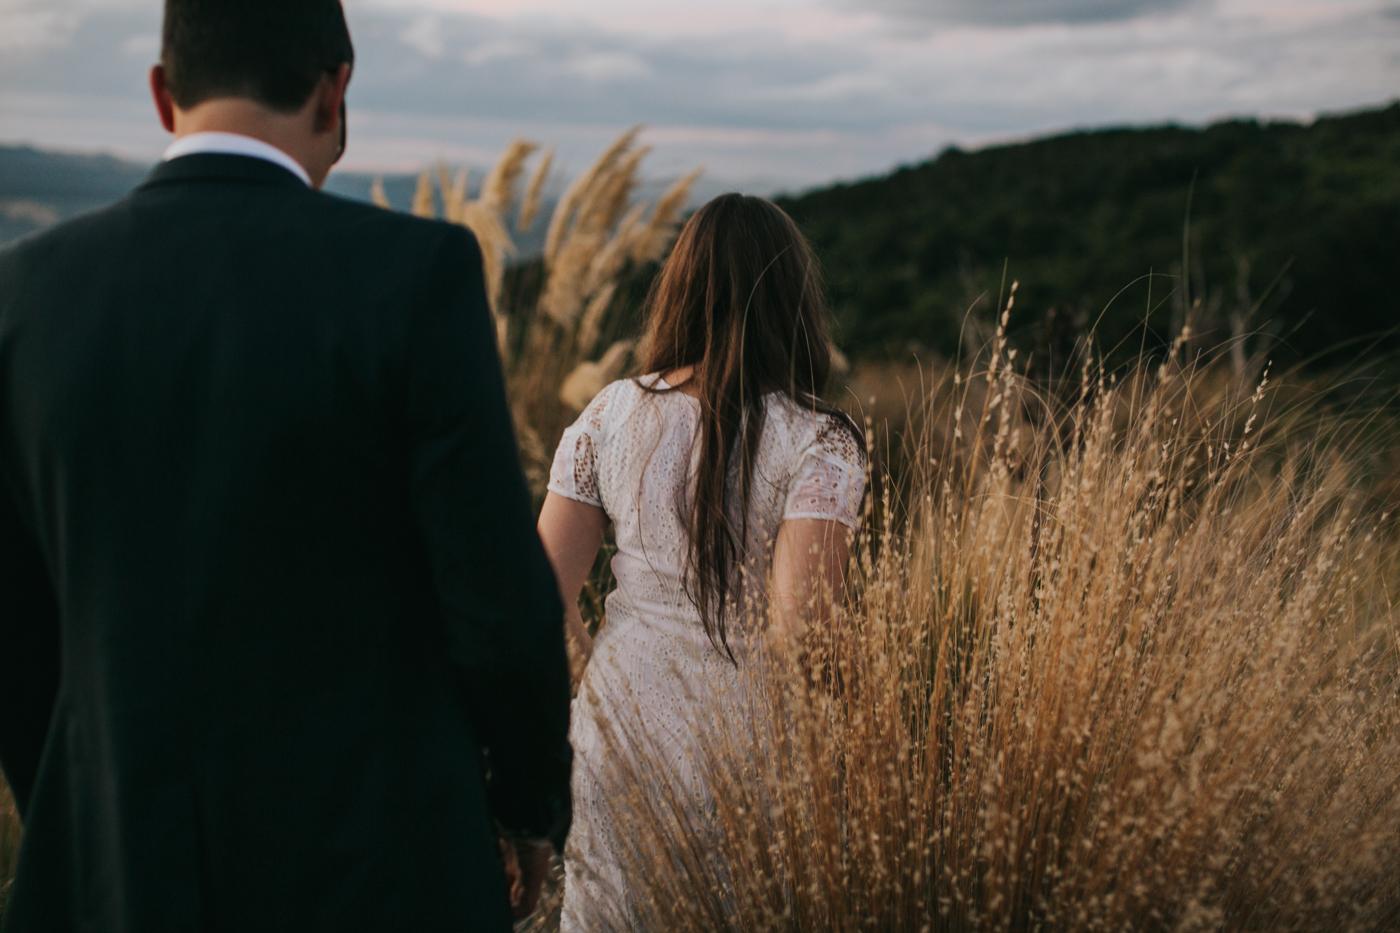 Ariana & Tim - Dunedin, New Zealand Wedding - Destination Wedding - Samantha Heather Photography-260.jpg